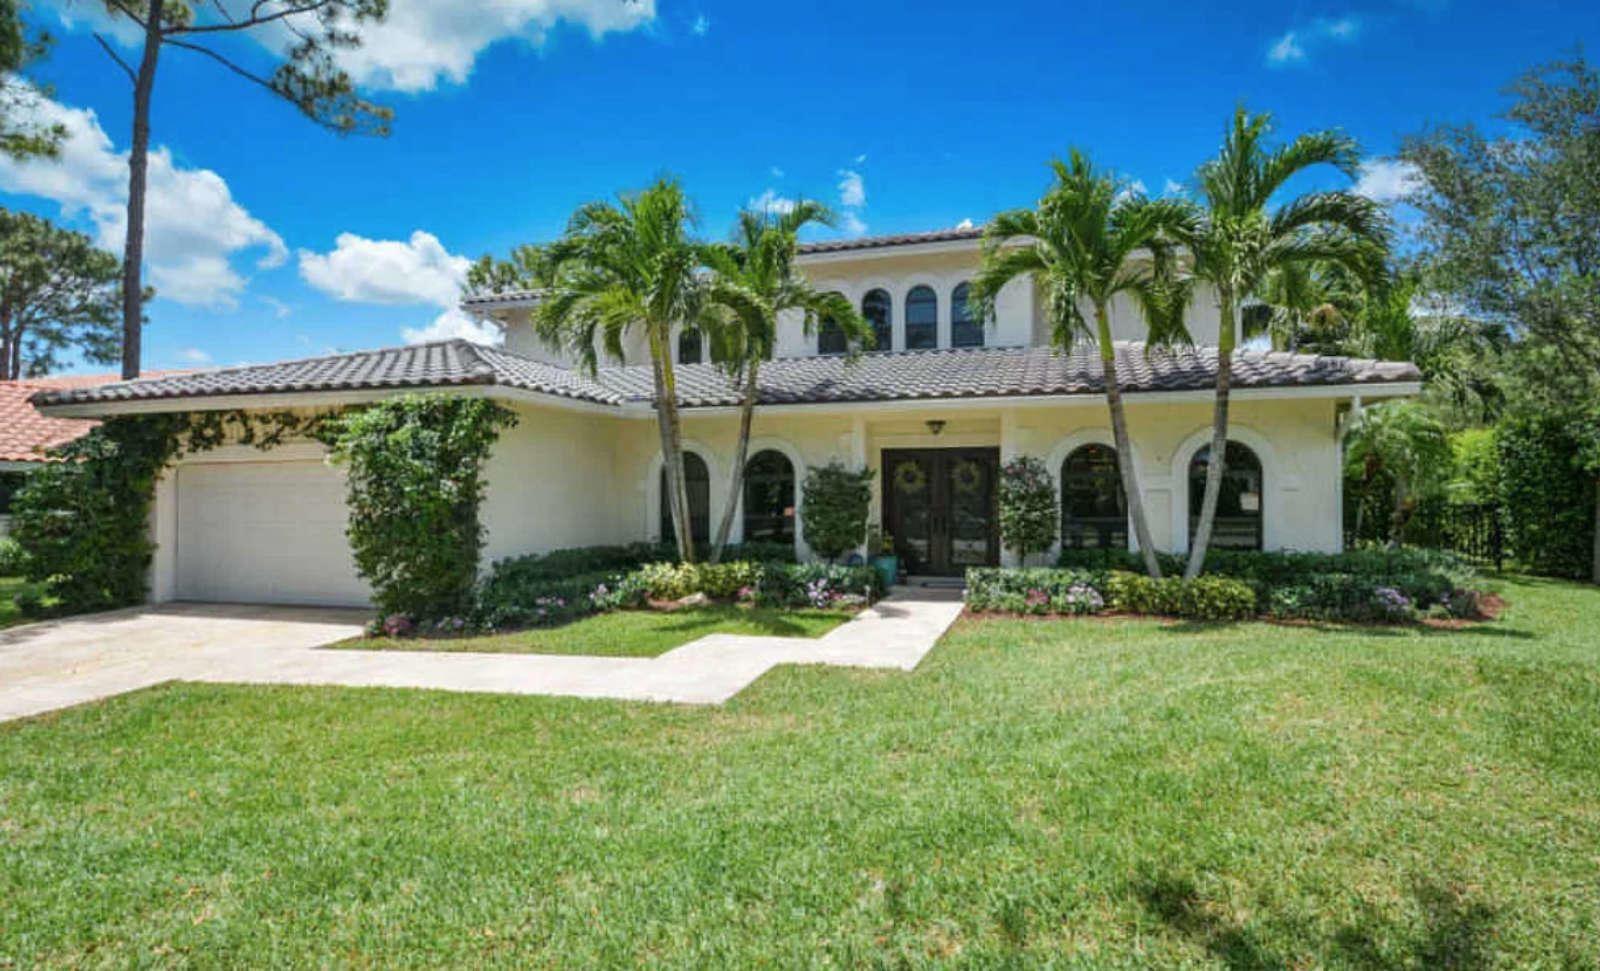 2799 NW 27th Terrace, Boca Raton, FL 33434 - #: RX-10633623